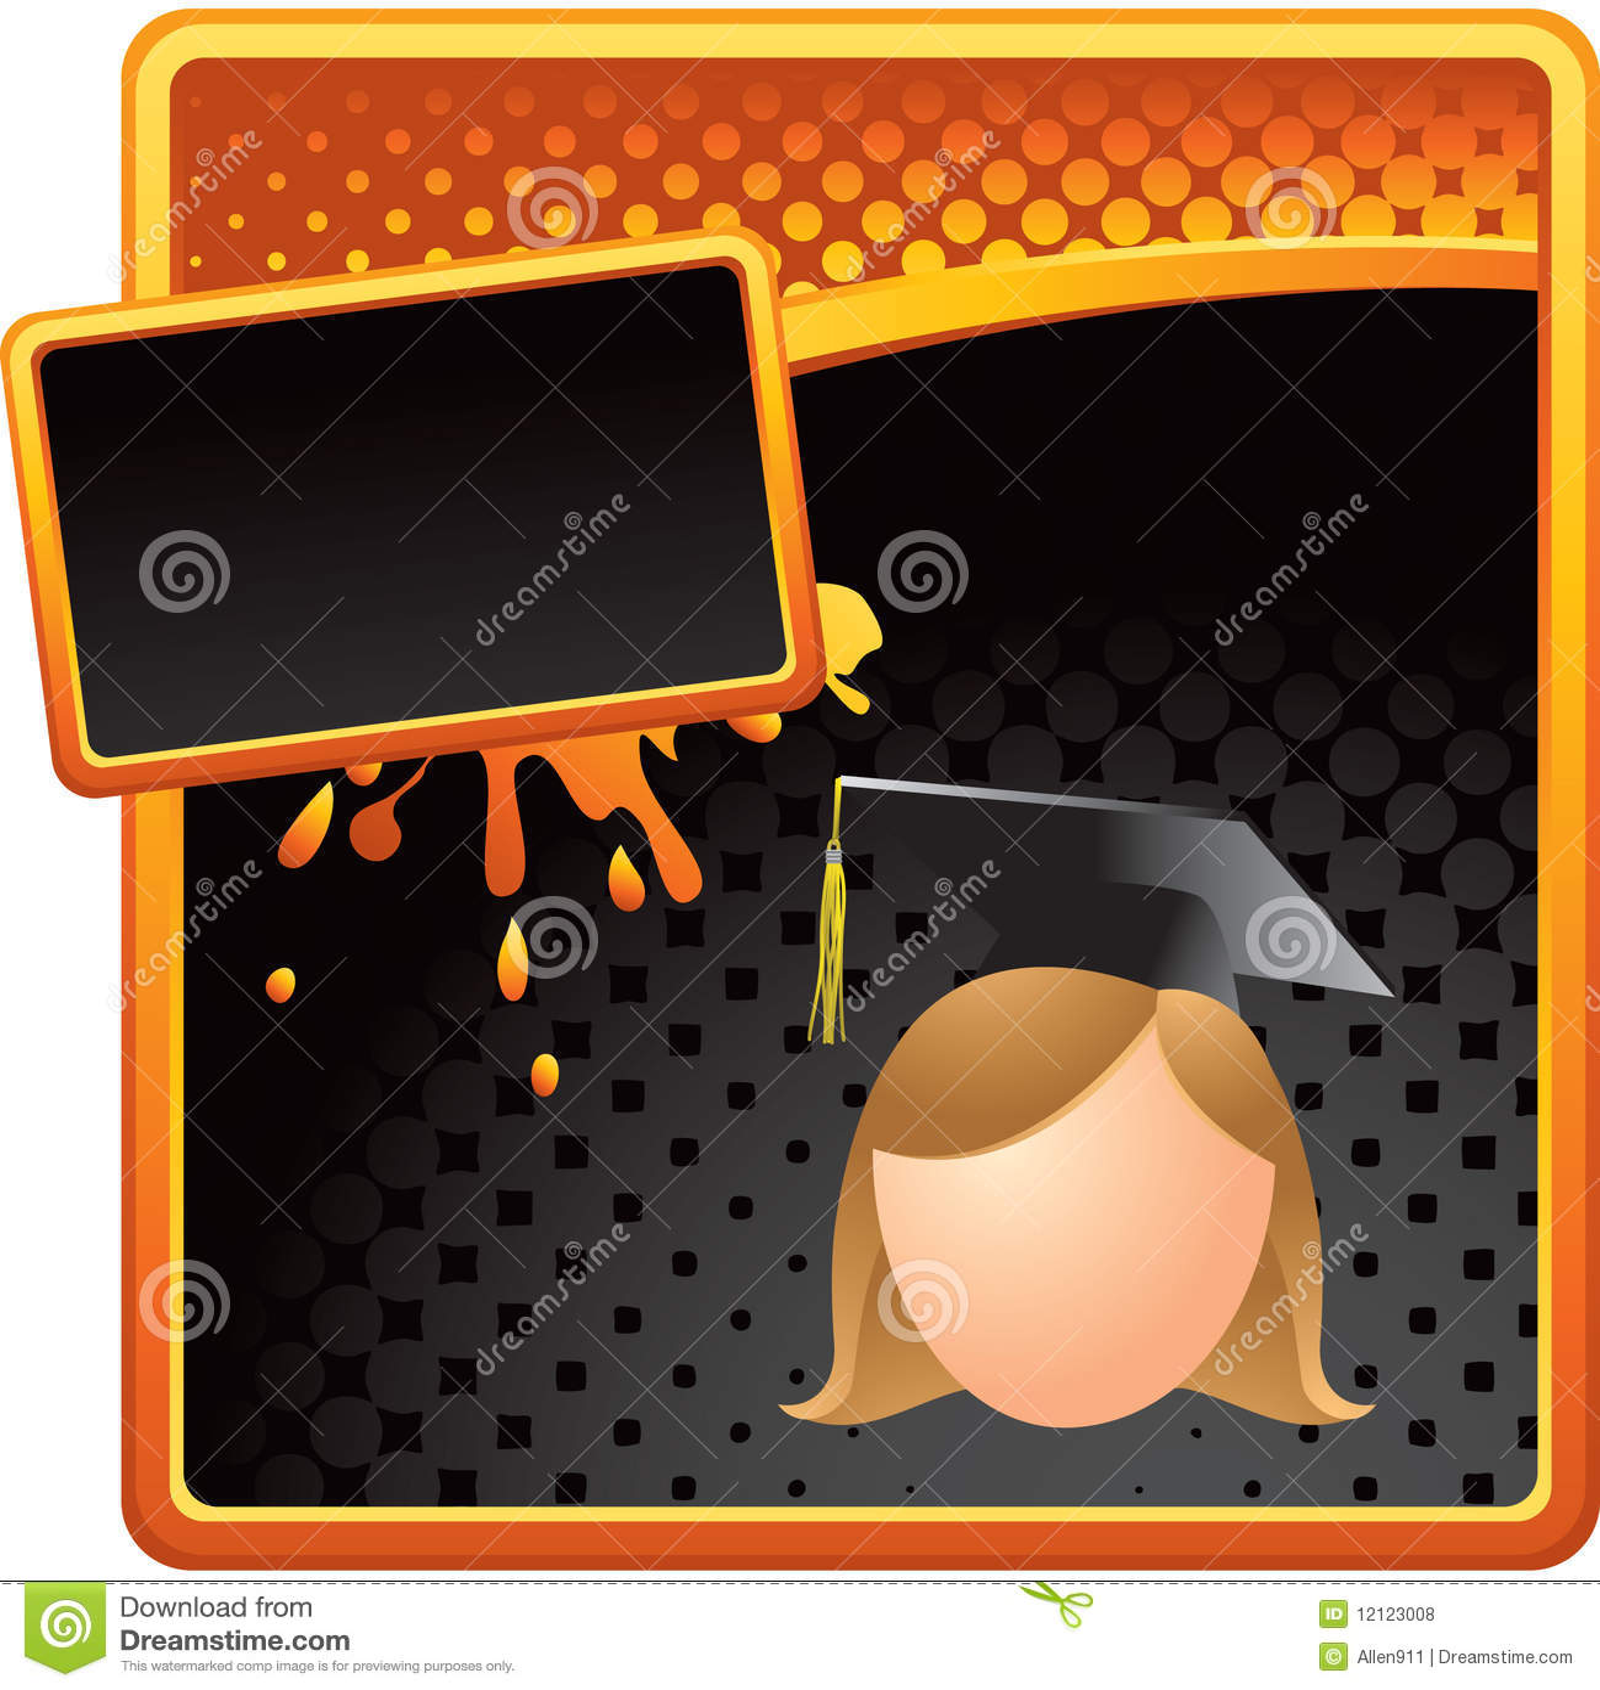 Orange and black ad with cartoon graduate girl